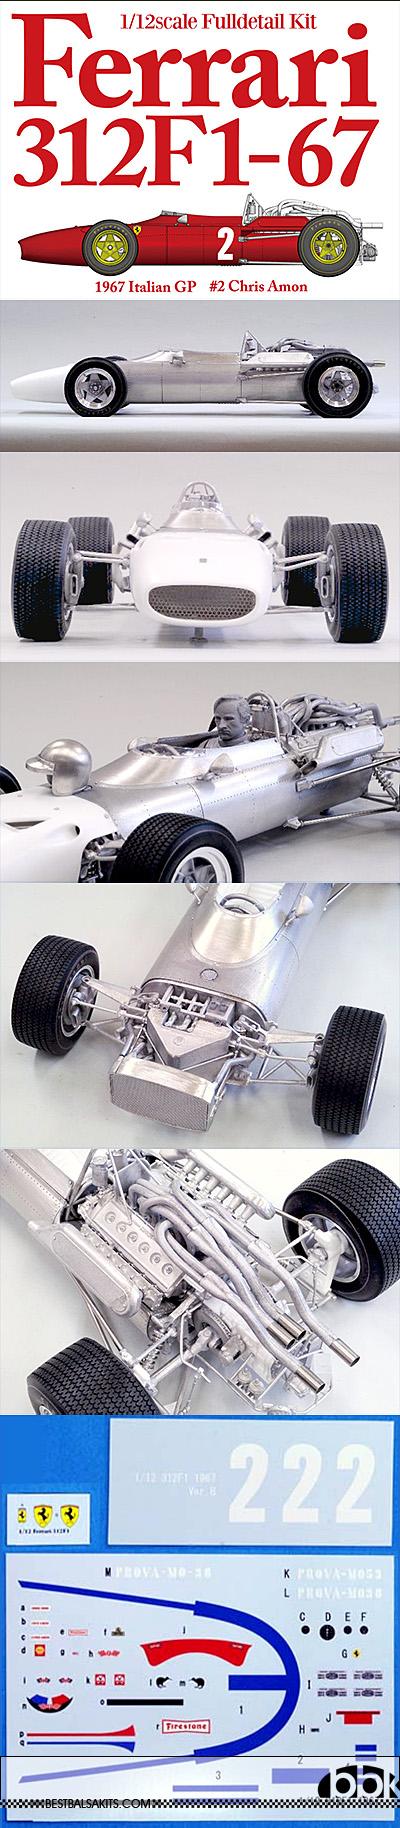 HIRO 1/12 FERRARI 312F1 1967 ITALIAN GP #2 AMON